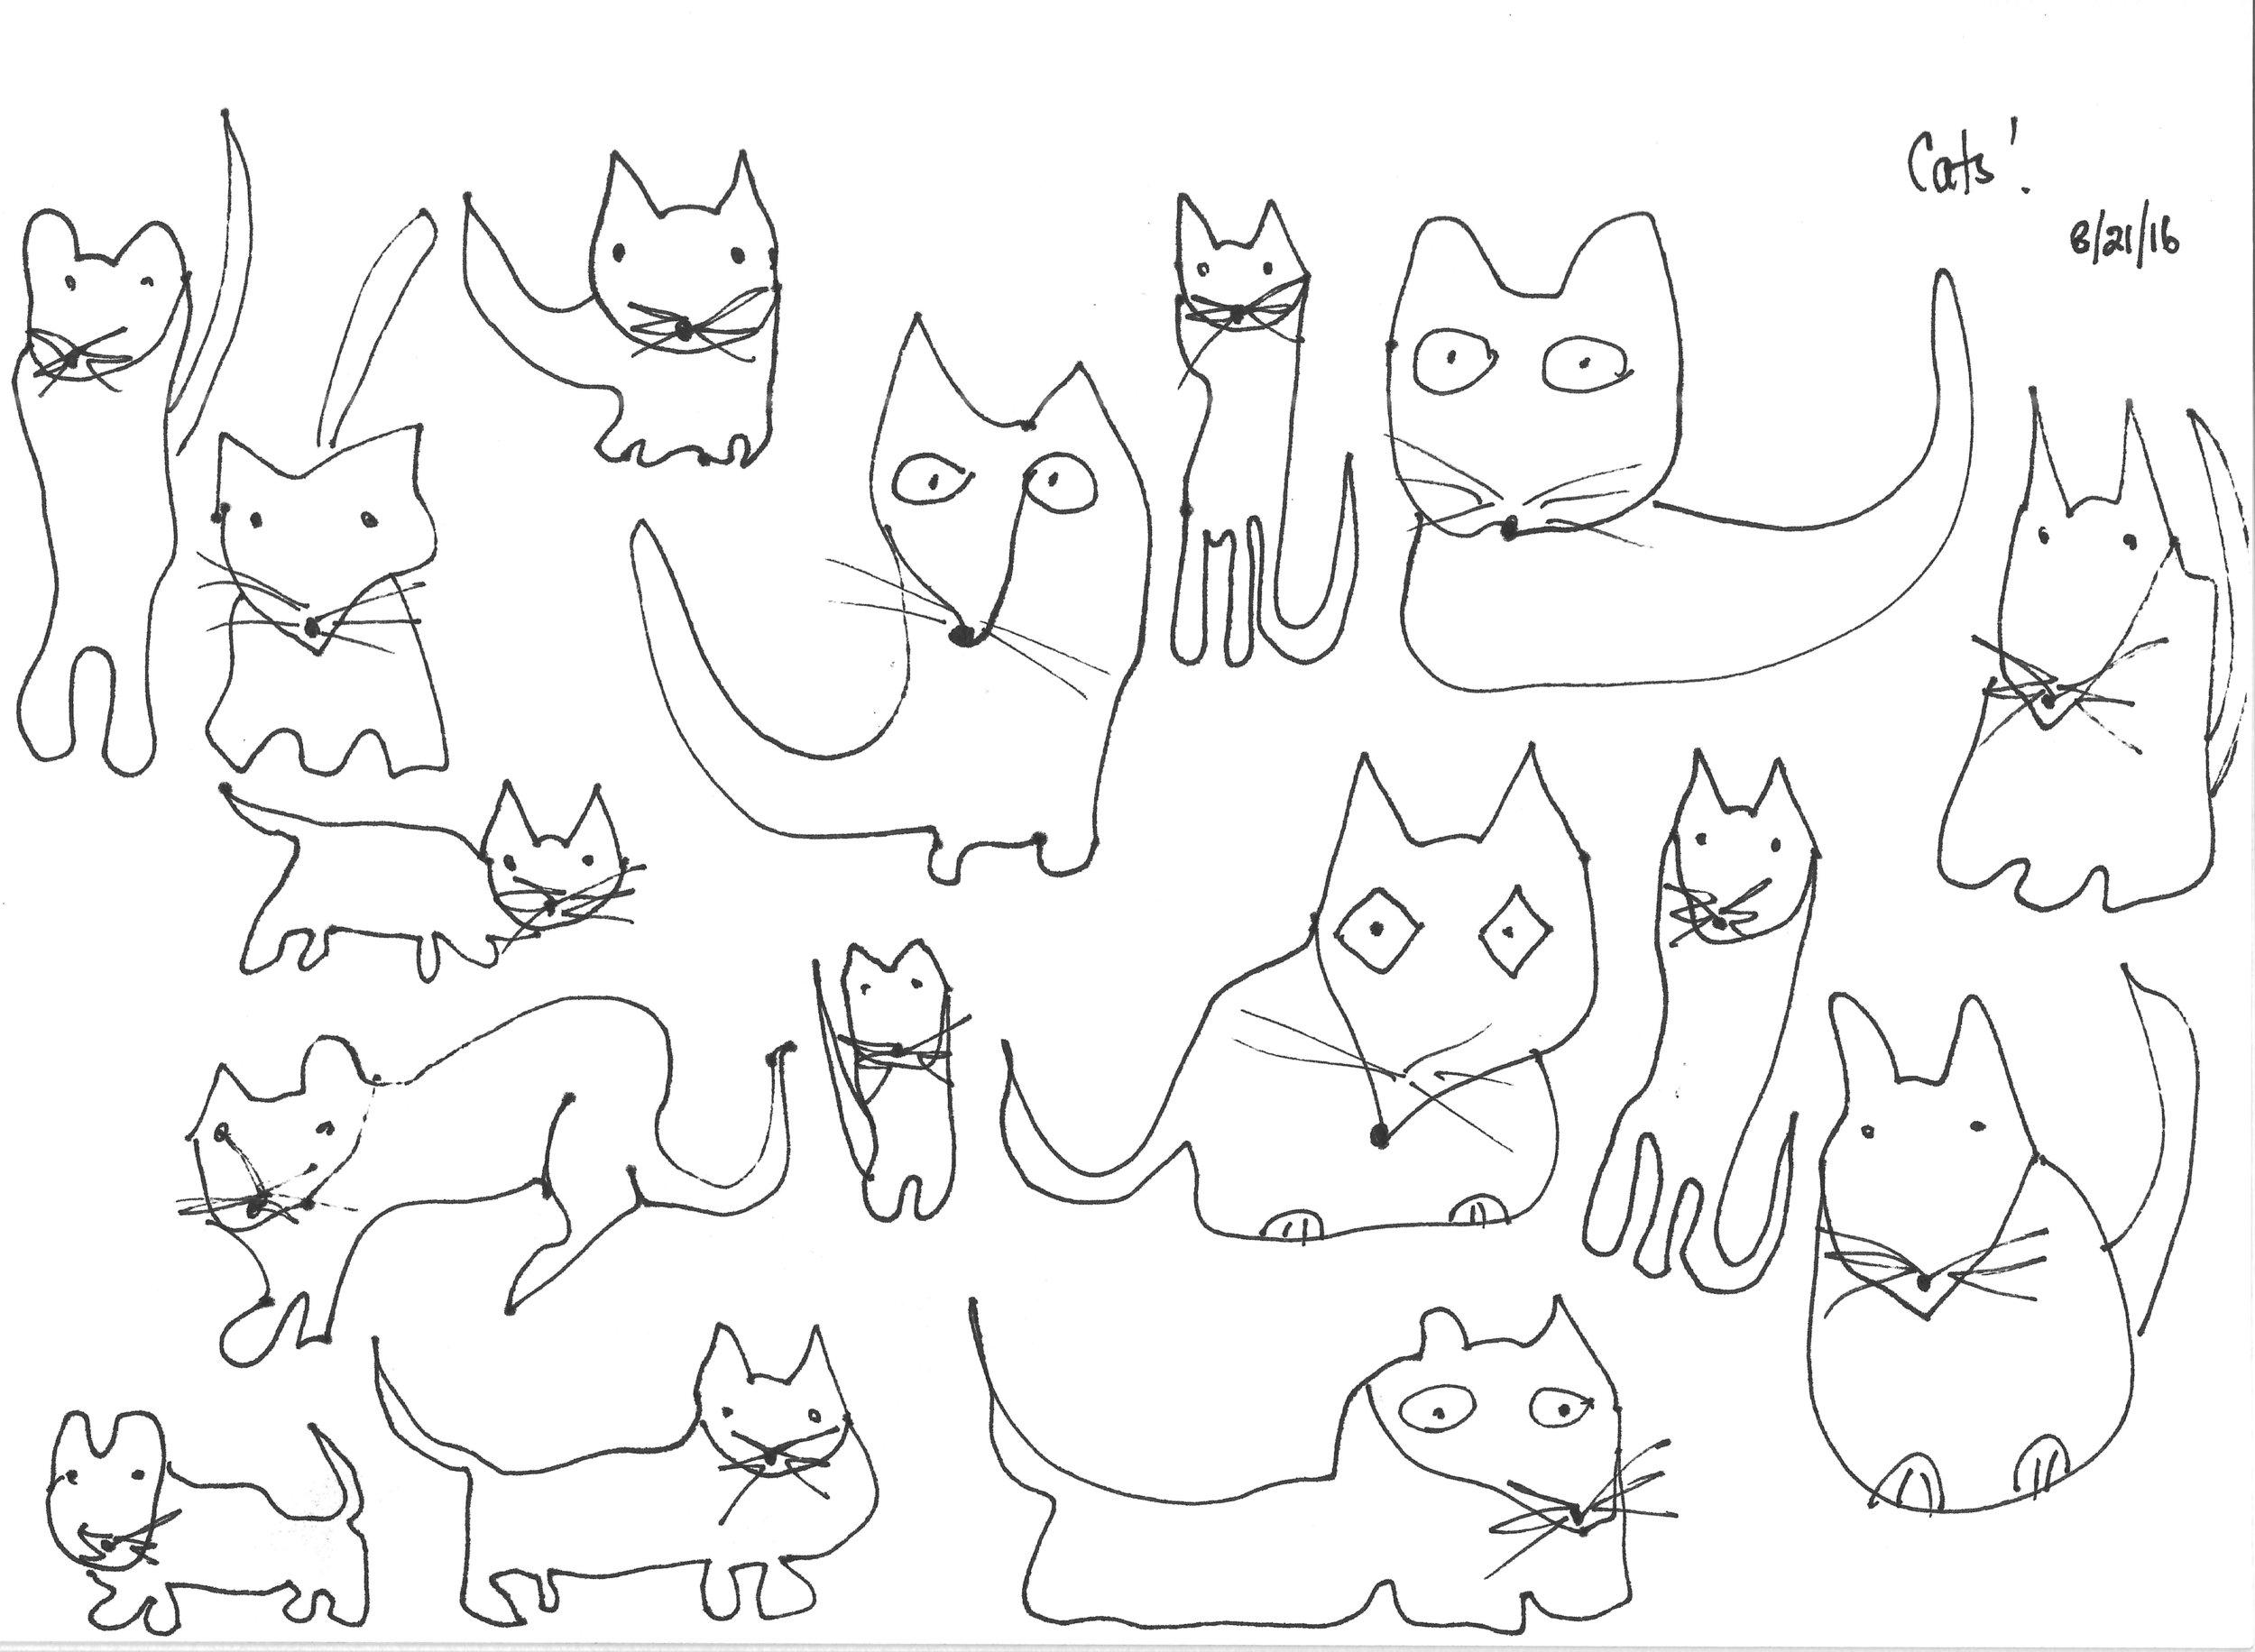 Non-dominant hand cats.jpeg